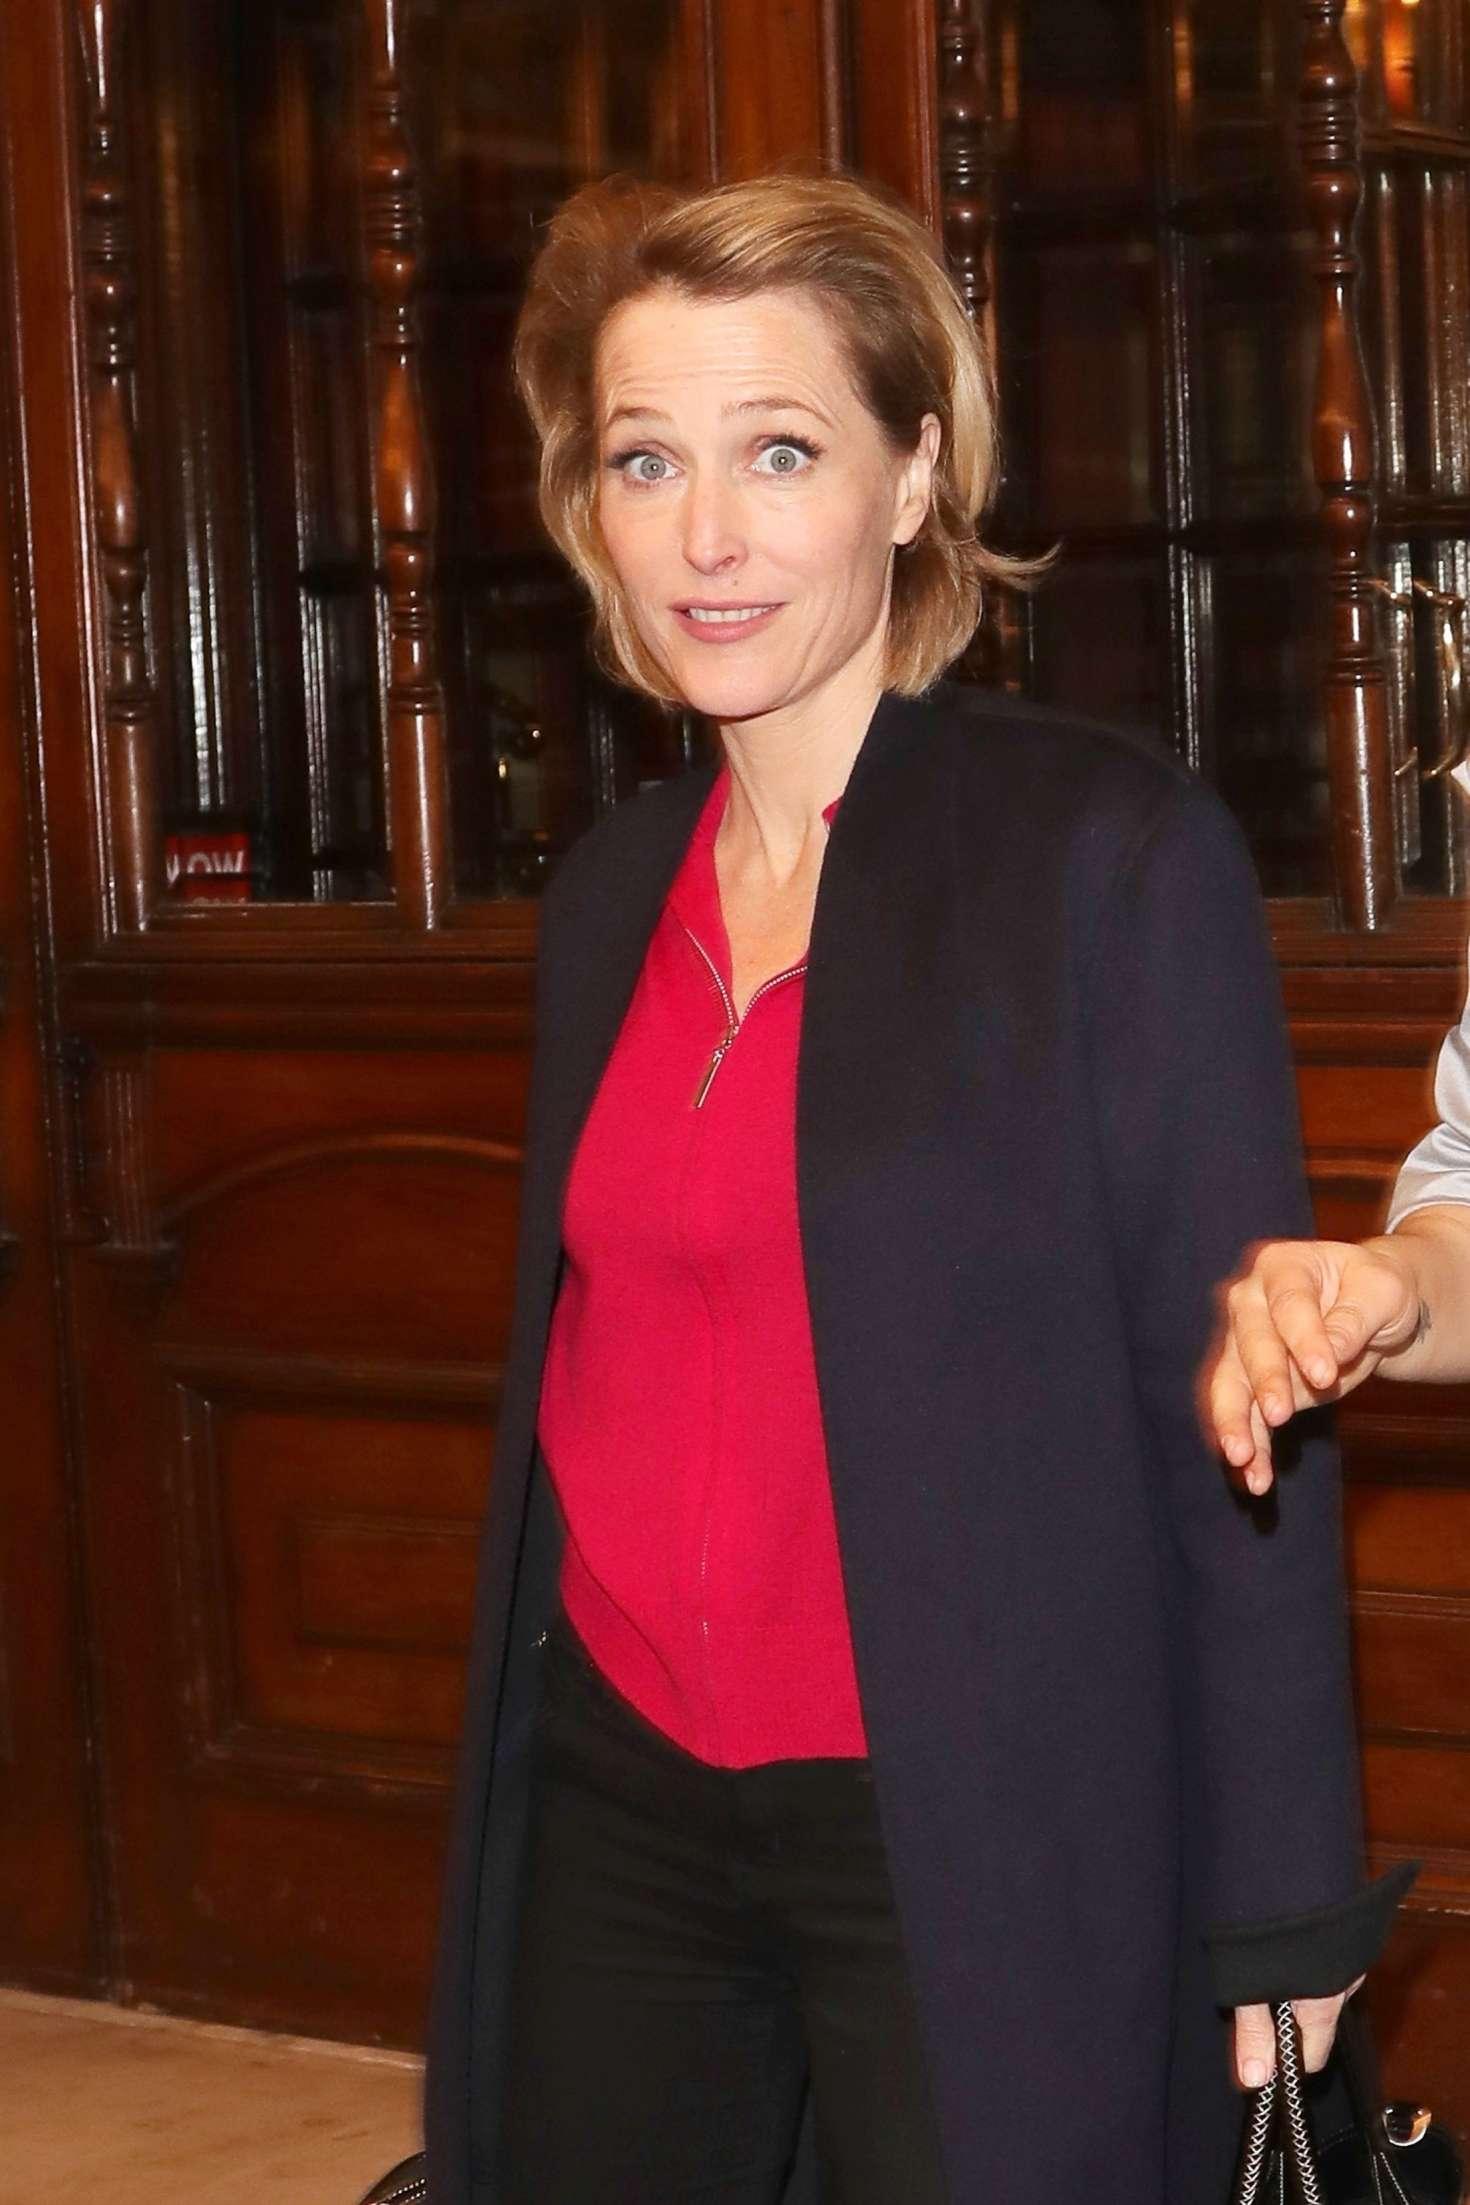 Gillian Anderson - Leaving the Noel Coward Theatre in London